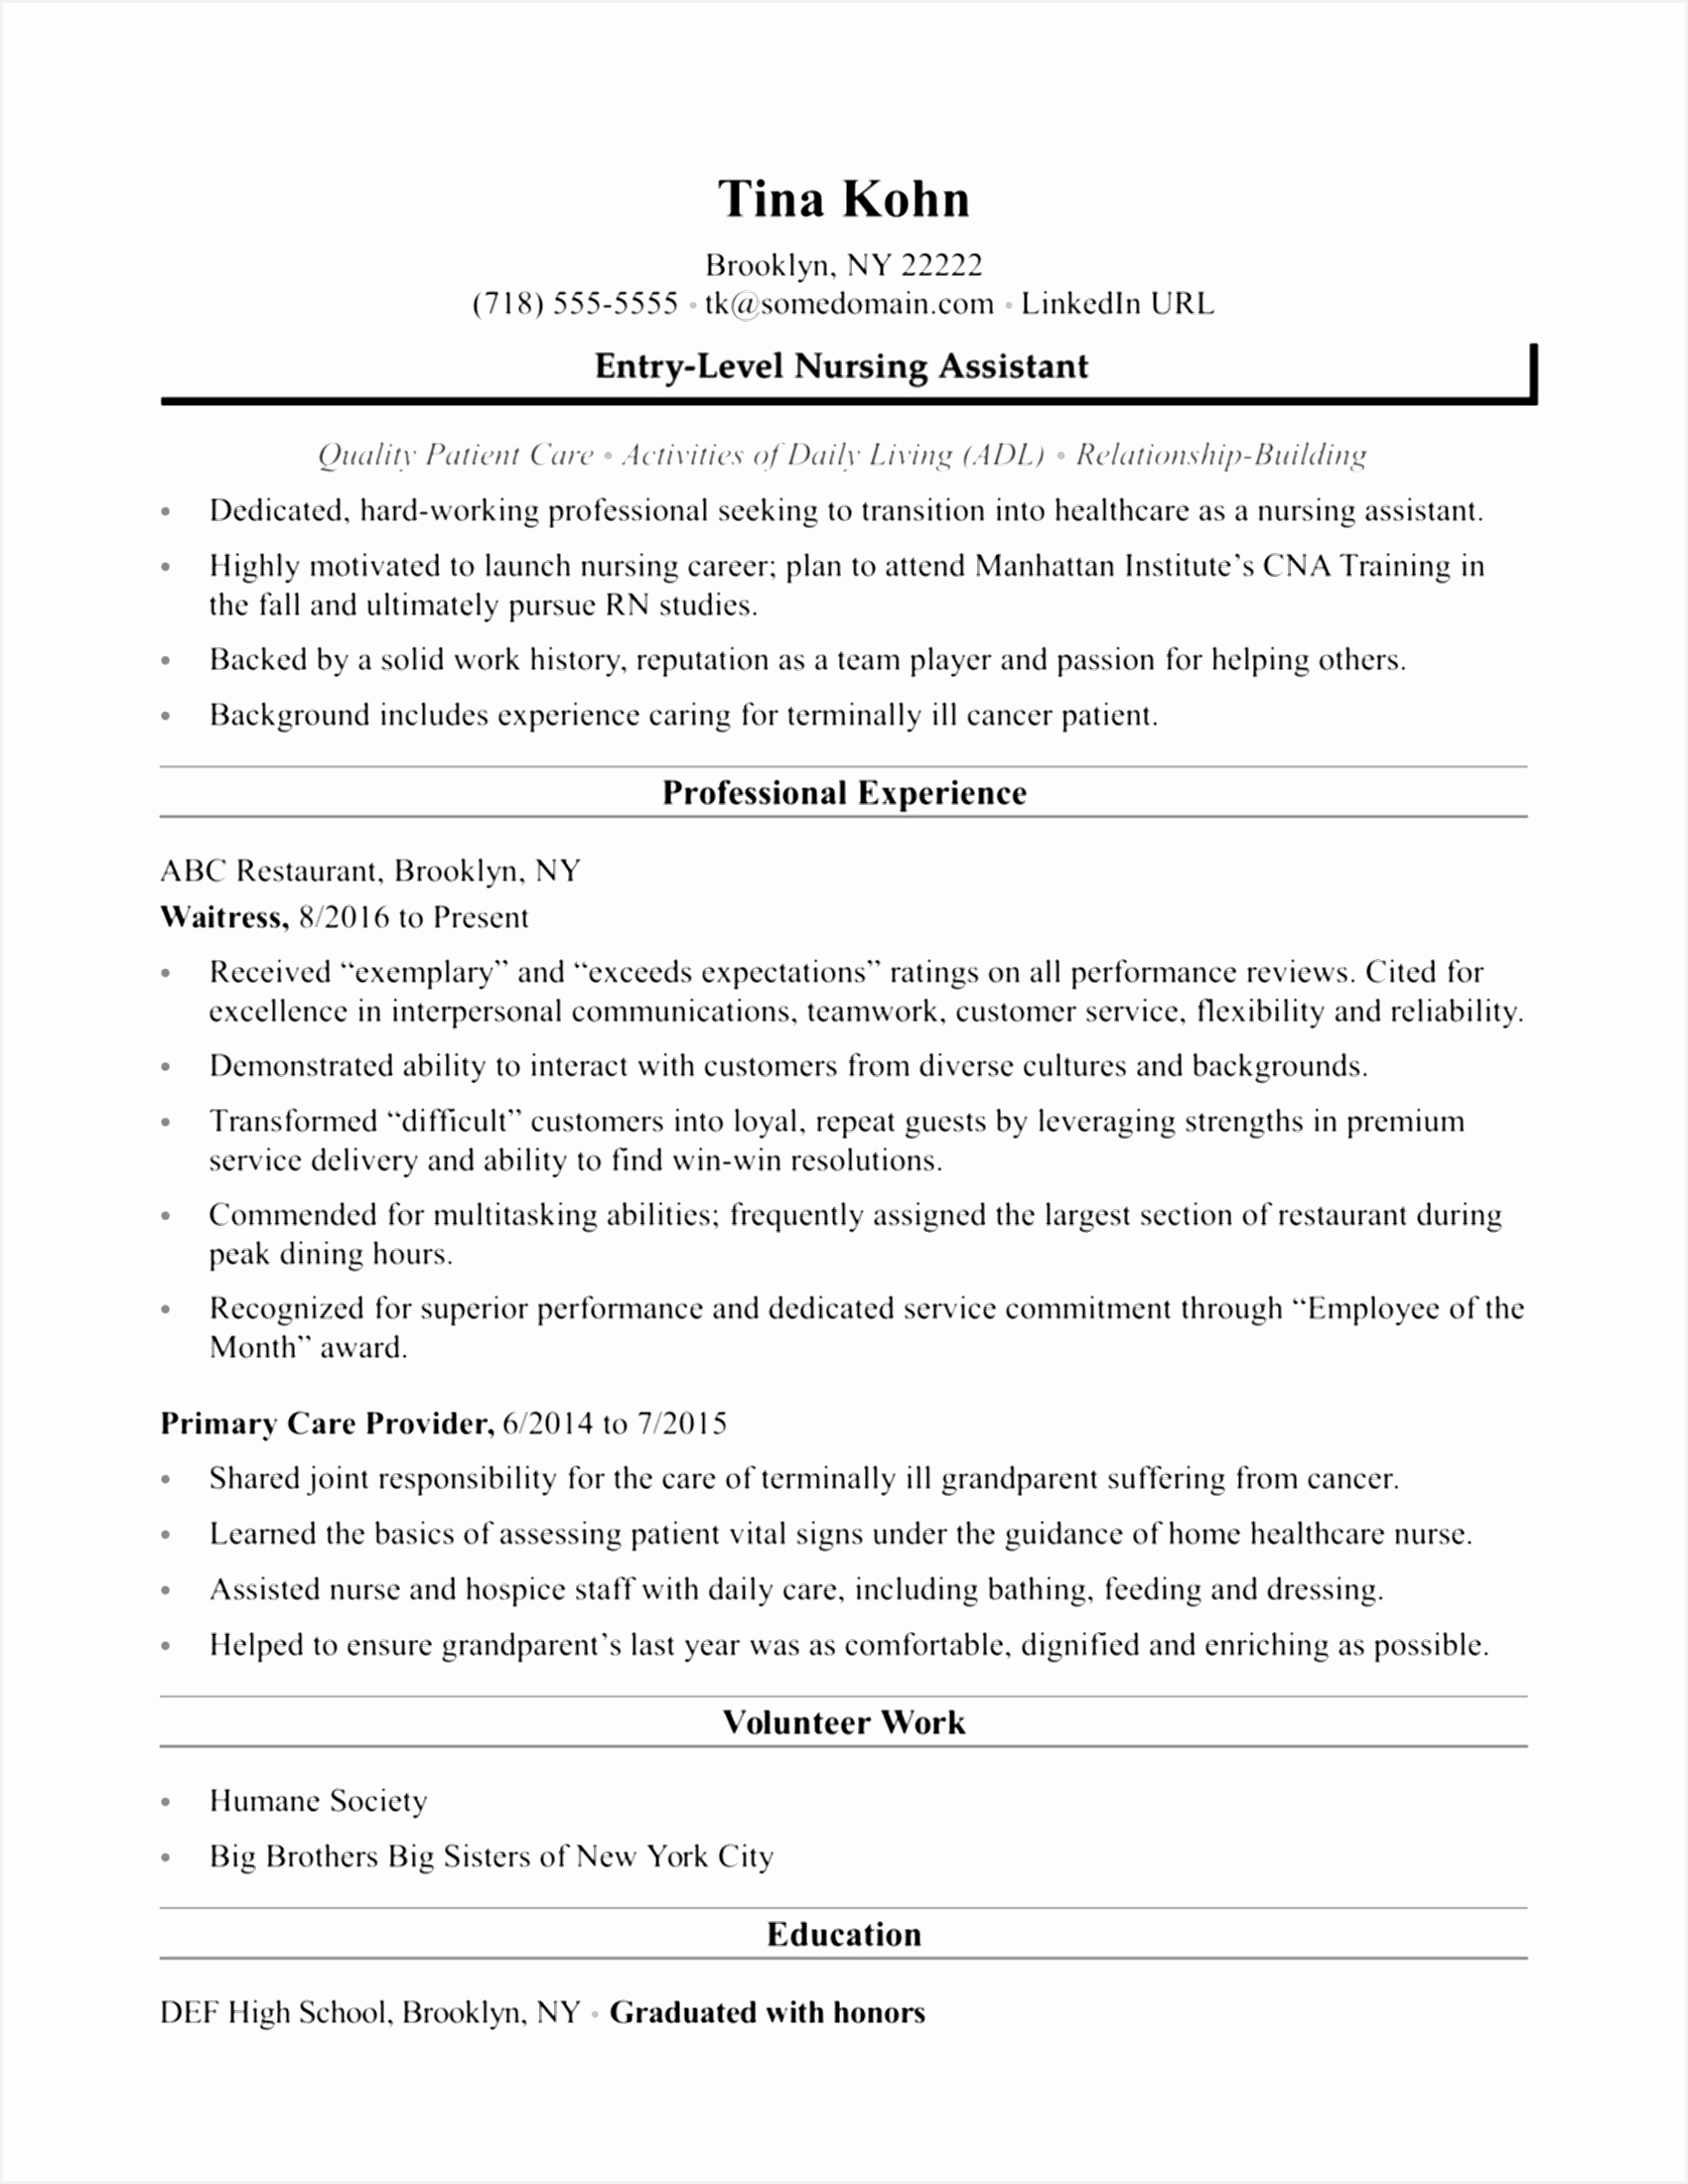 Medical Resume Template Awesome Entry Level Cna Resume Beautiful Elegant Cna Resume Samples Fresh Medical22001700